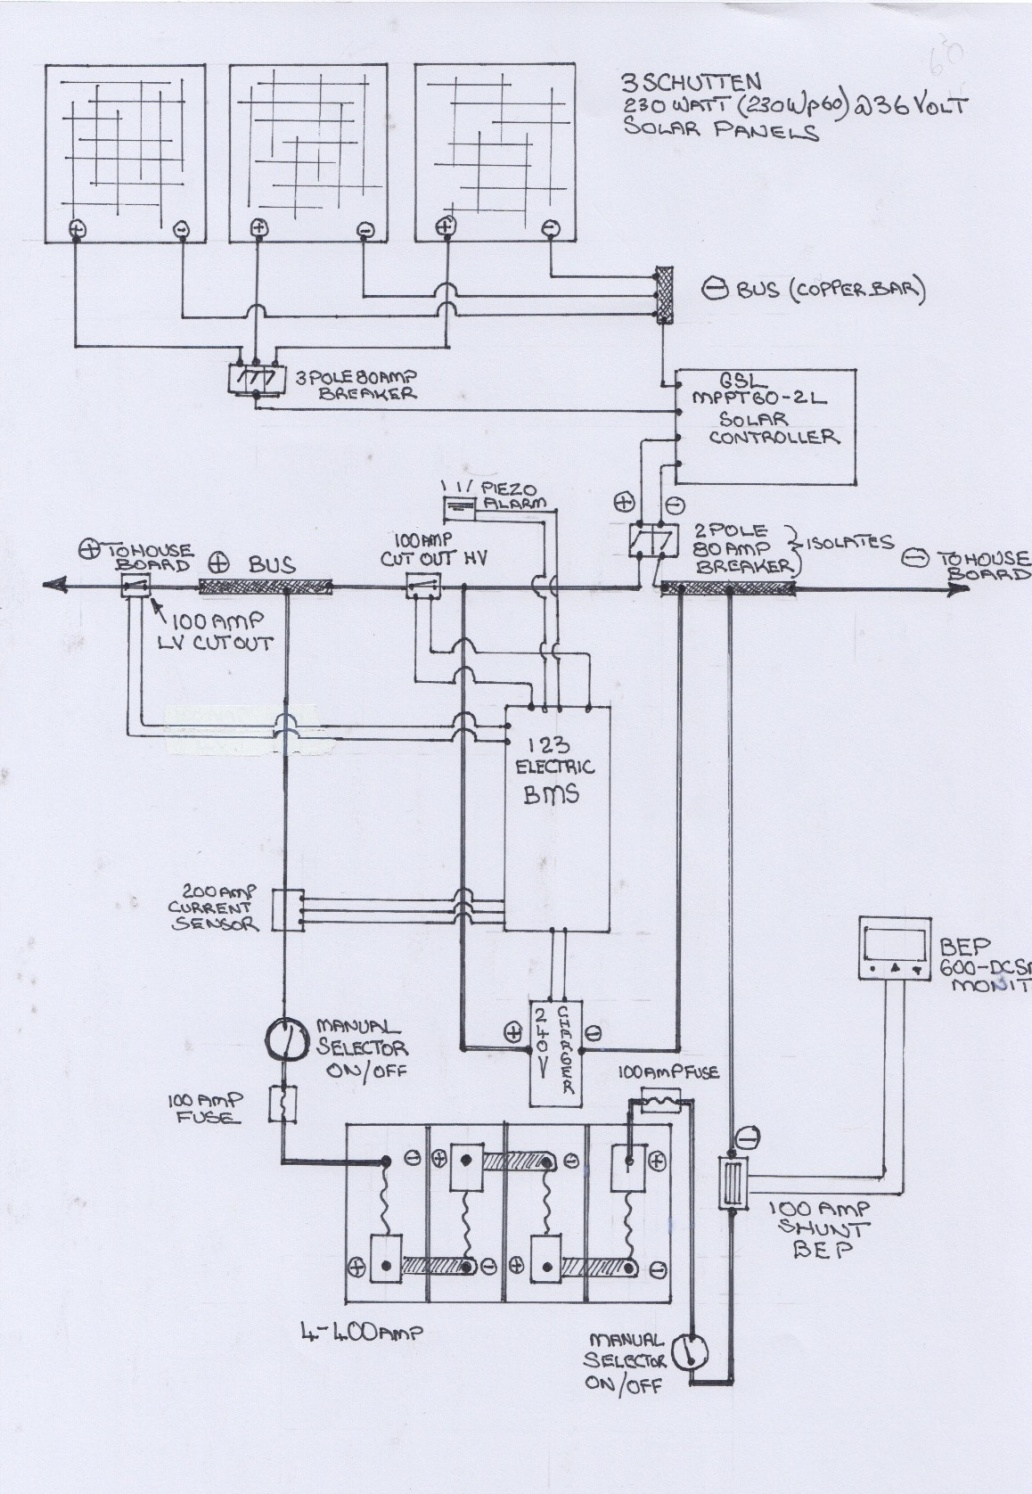 centurion cs 3000 wiring diagram wiring diagram and hernes centurion 3000 wiring diagram and hernes